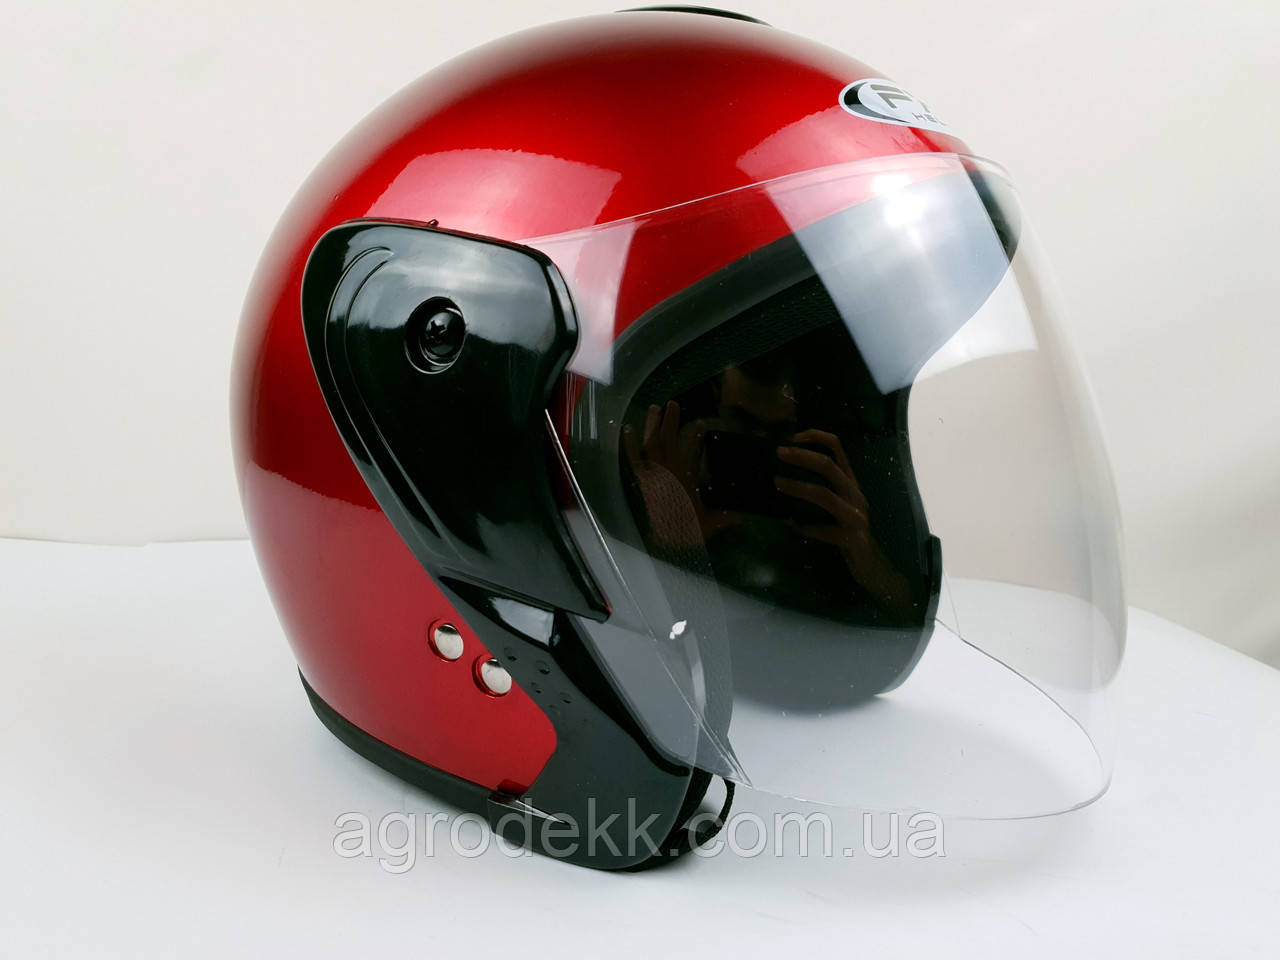 Шолом для мотоцикла Hel-Met 217 червоний глянець